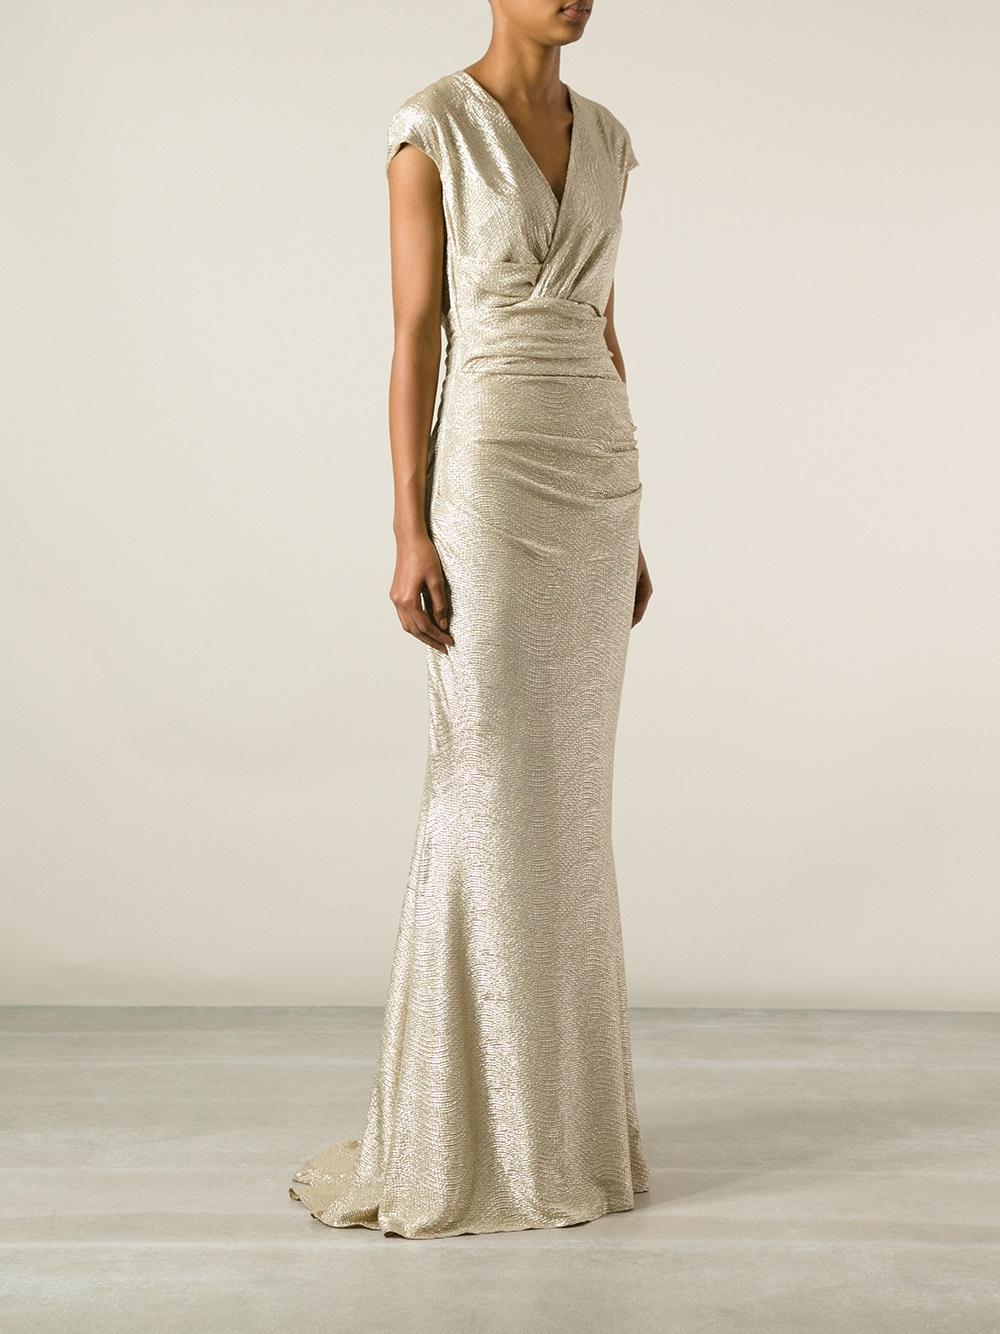 Lyst Talbot Runhof Doccia Evening Dress In Metallic